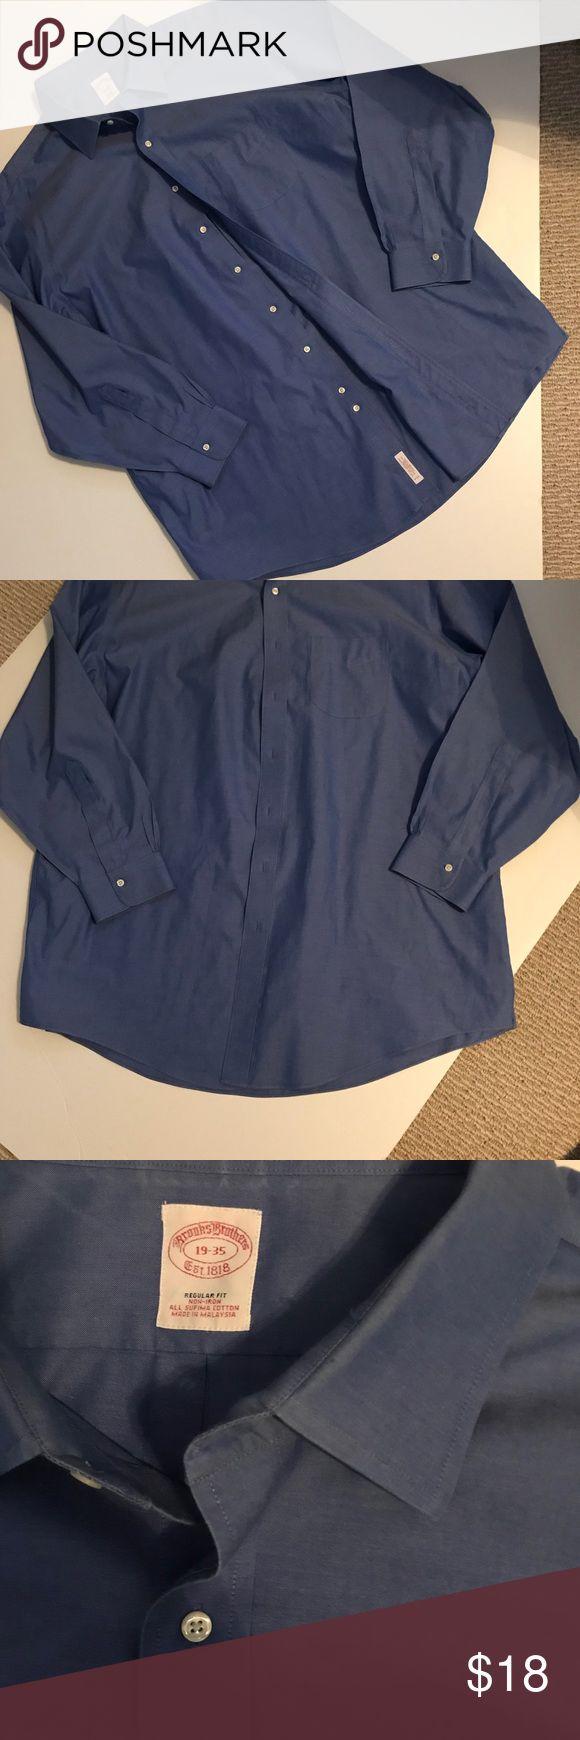 "Brooks Brothers dress shirt. Size 19-35. Like new BROOKS BROTHERS LONG SLEEVE NON IRON Dress Shirt 19-35Light Sky Blue. Regular fit. Supima Cotton. ""Like new"" condition. Brooks Brothers Shirts Dress Shirts"